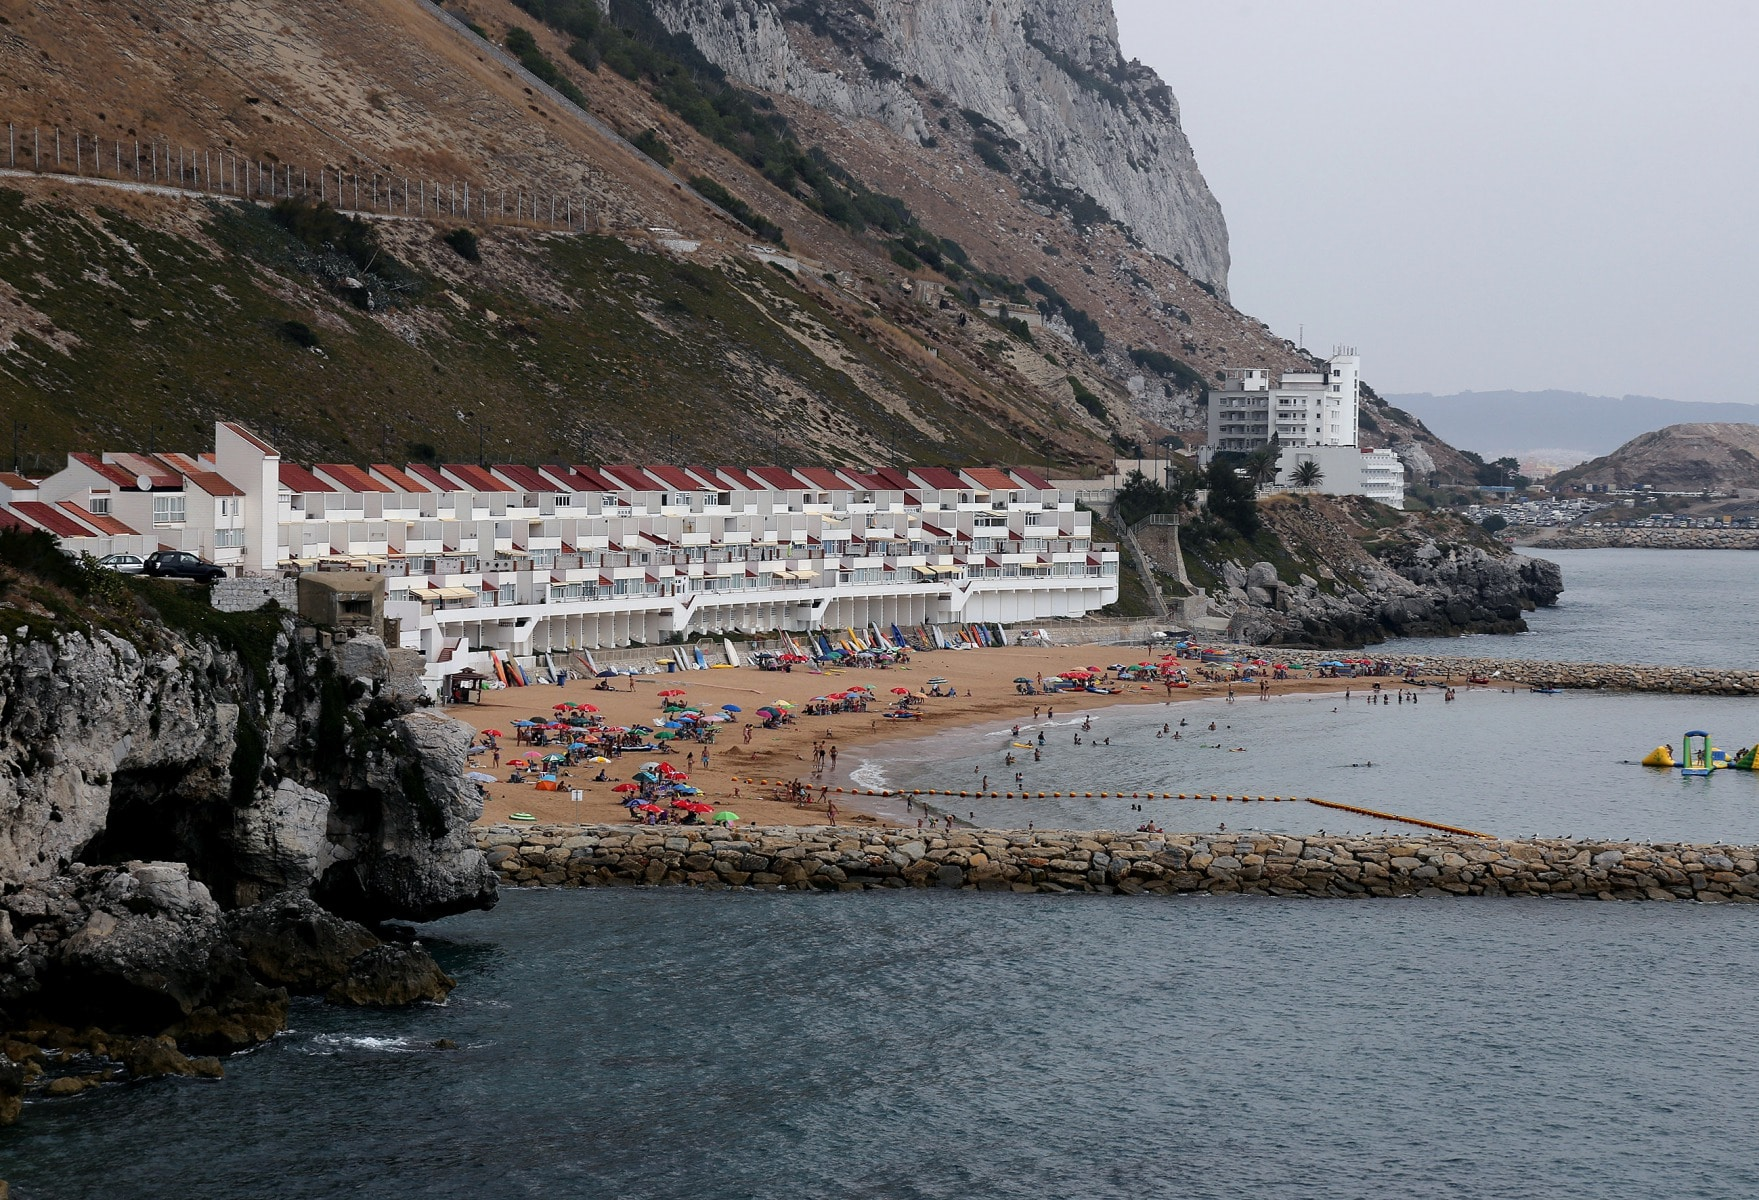 beaches-6_24765379447_o